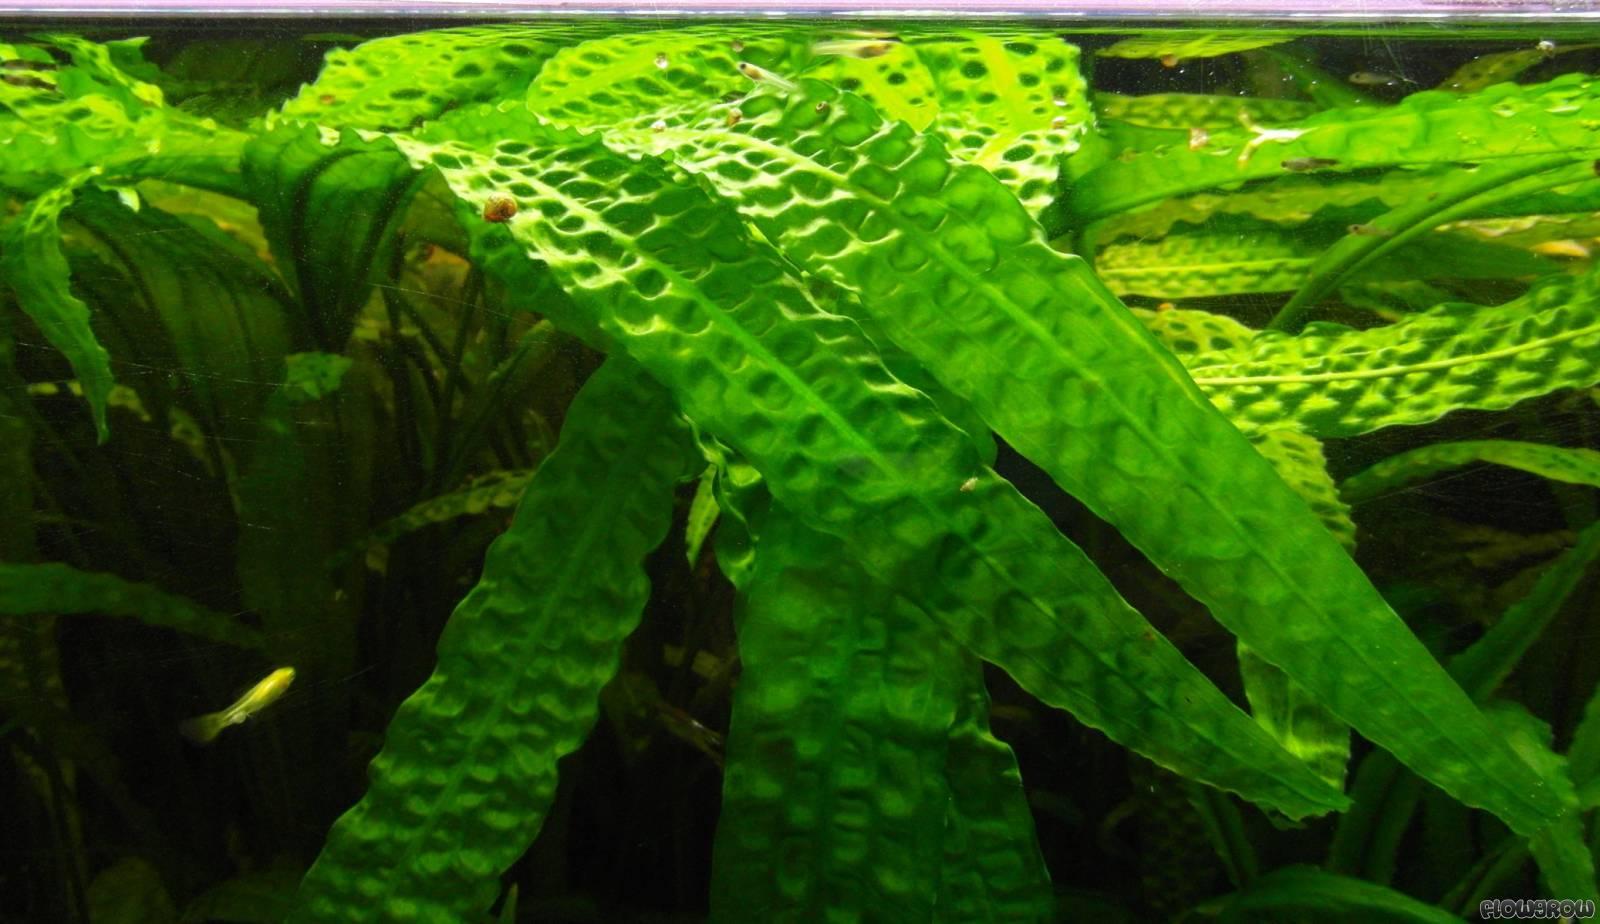 cryptocoryne aponogetifolia flowgrow aquatic plant database. Black Bedroom Furniture Sets. Home Design Ideas